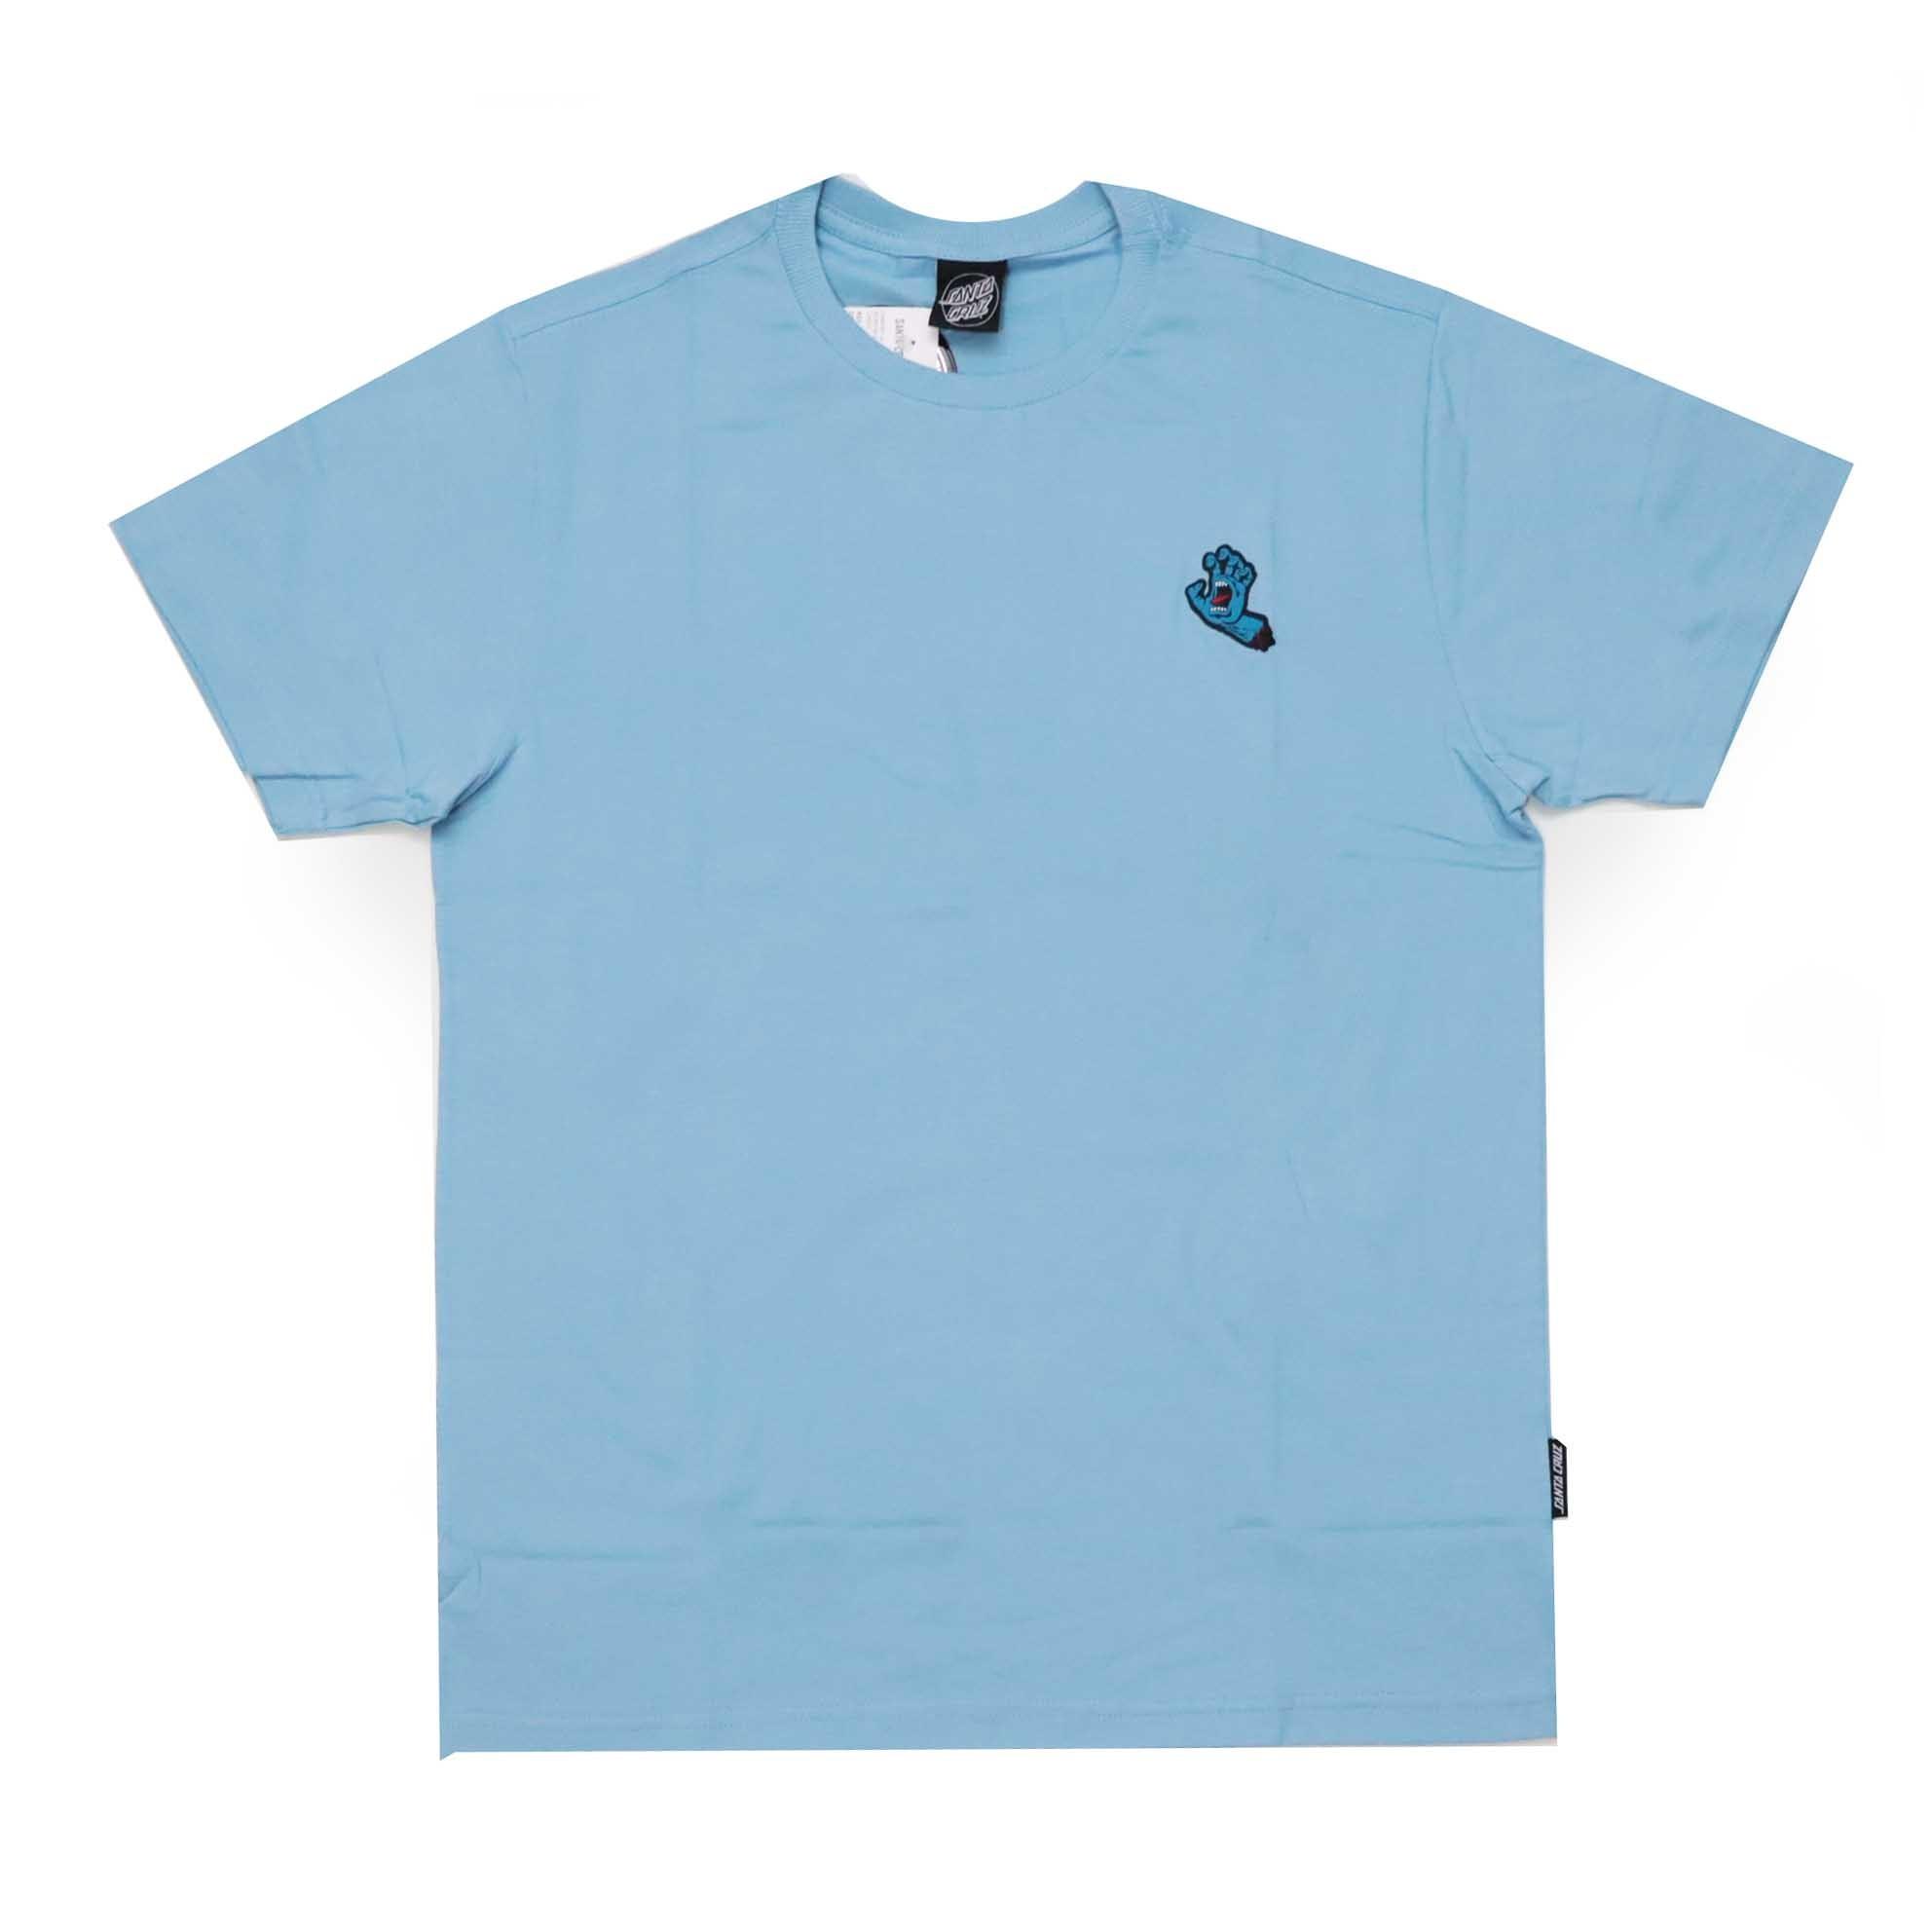 Camiseta Santa Cruz Screaming Hand Chest - Azul Claro